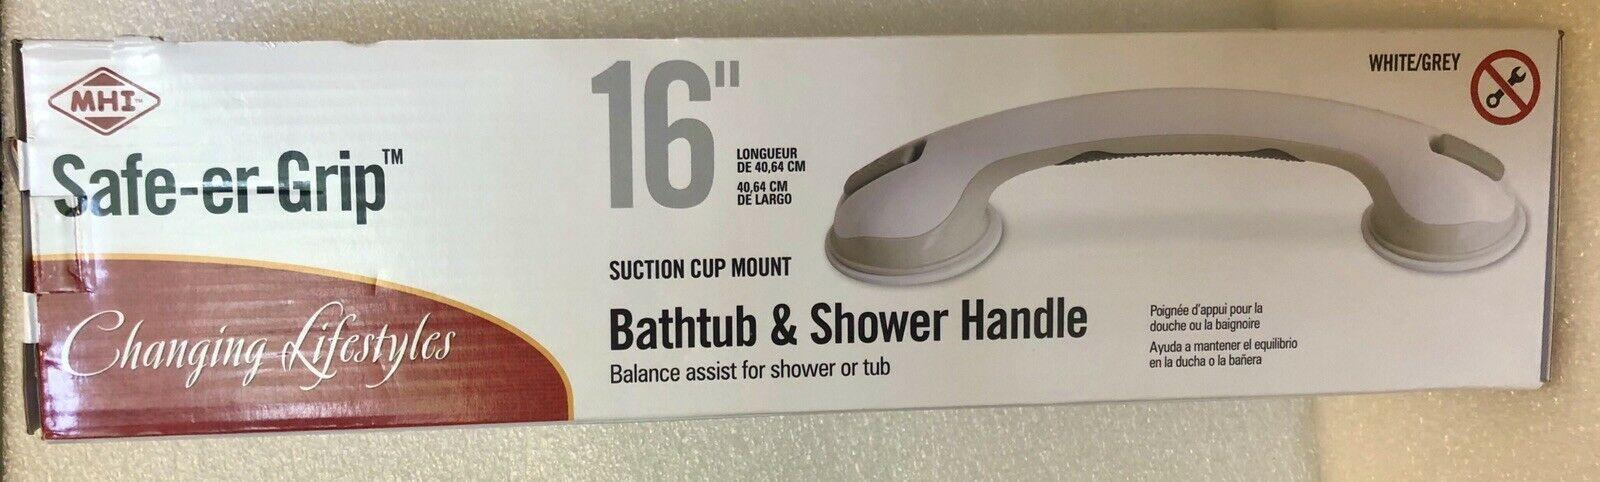 "Changing Lifestyles Safe-er-grip Bath Shower Handle Balance Assist 16"" - $12.57"